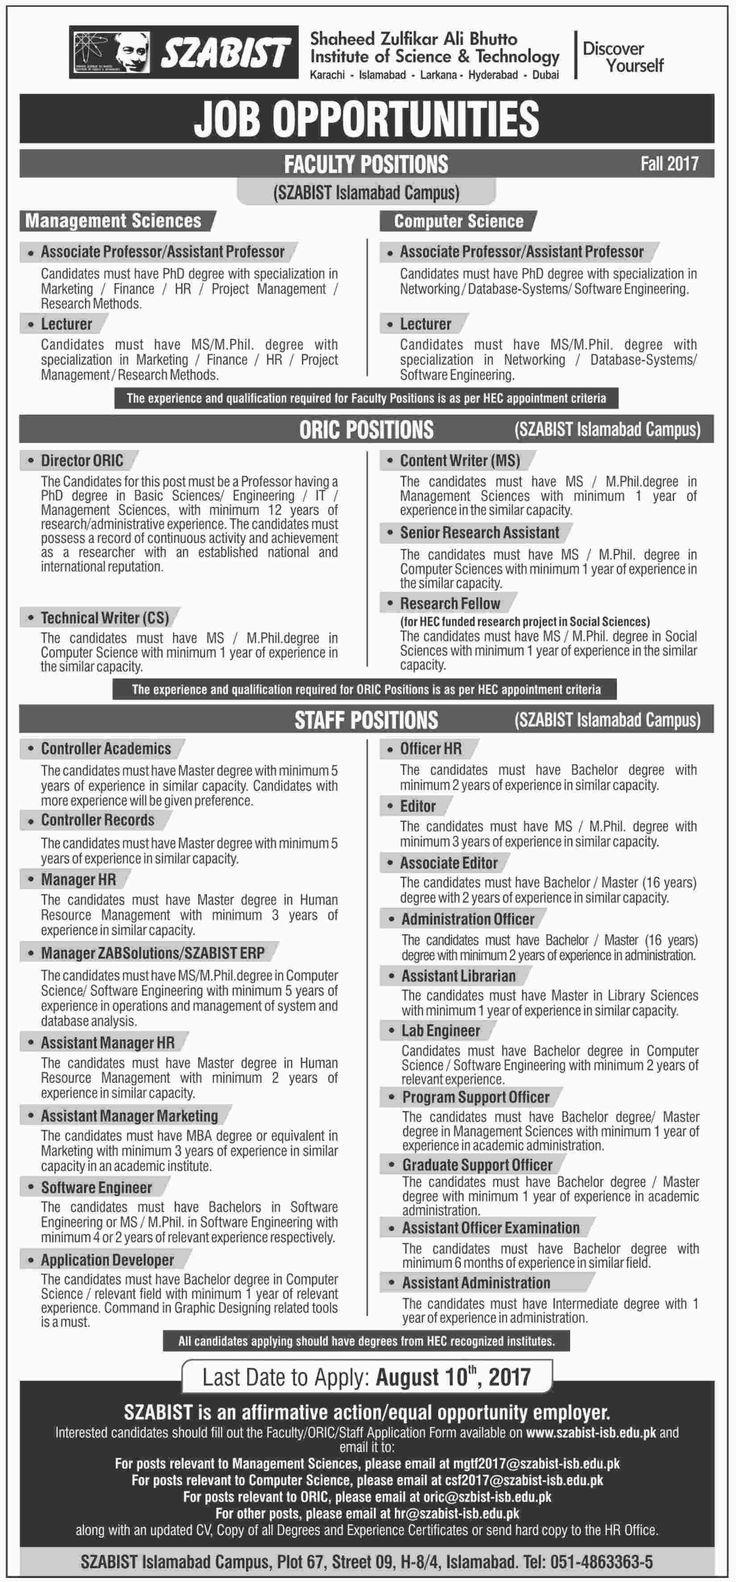 Shaheed Zulfikar Ali Bhutto Institute of Science & Technology Jobs, Islamabad Campus